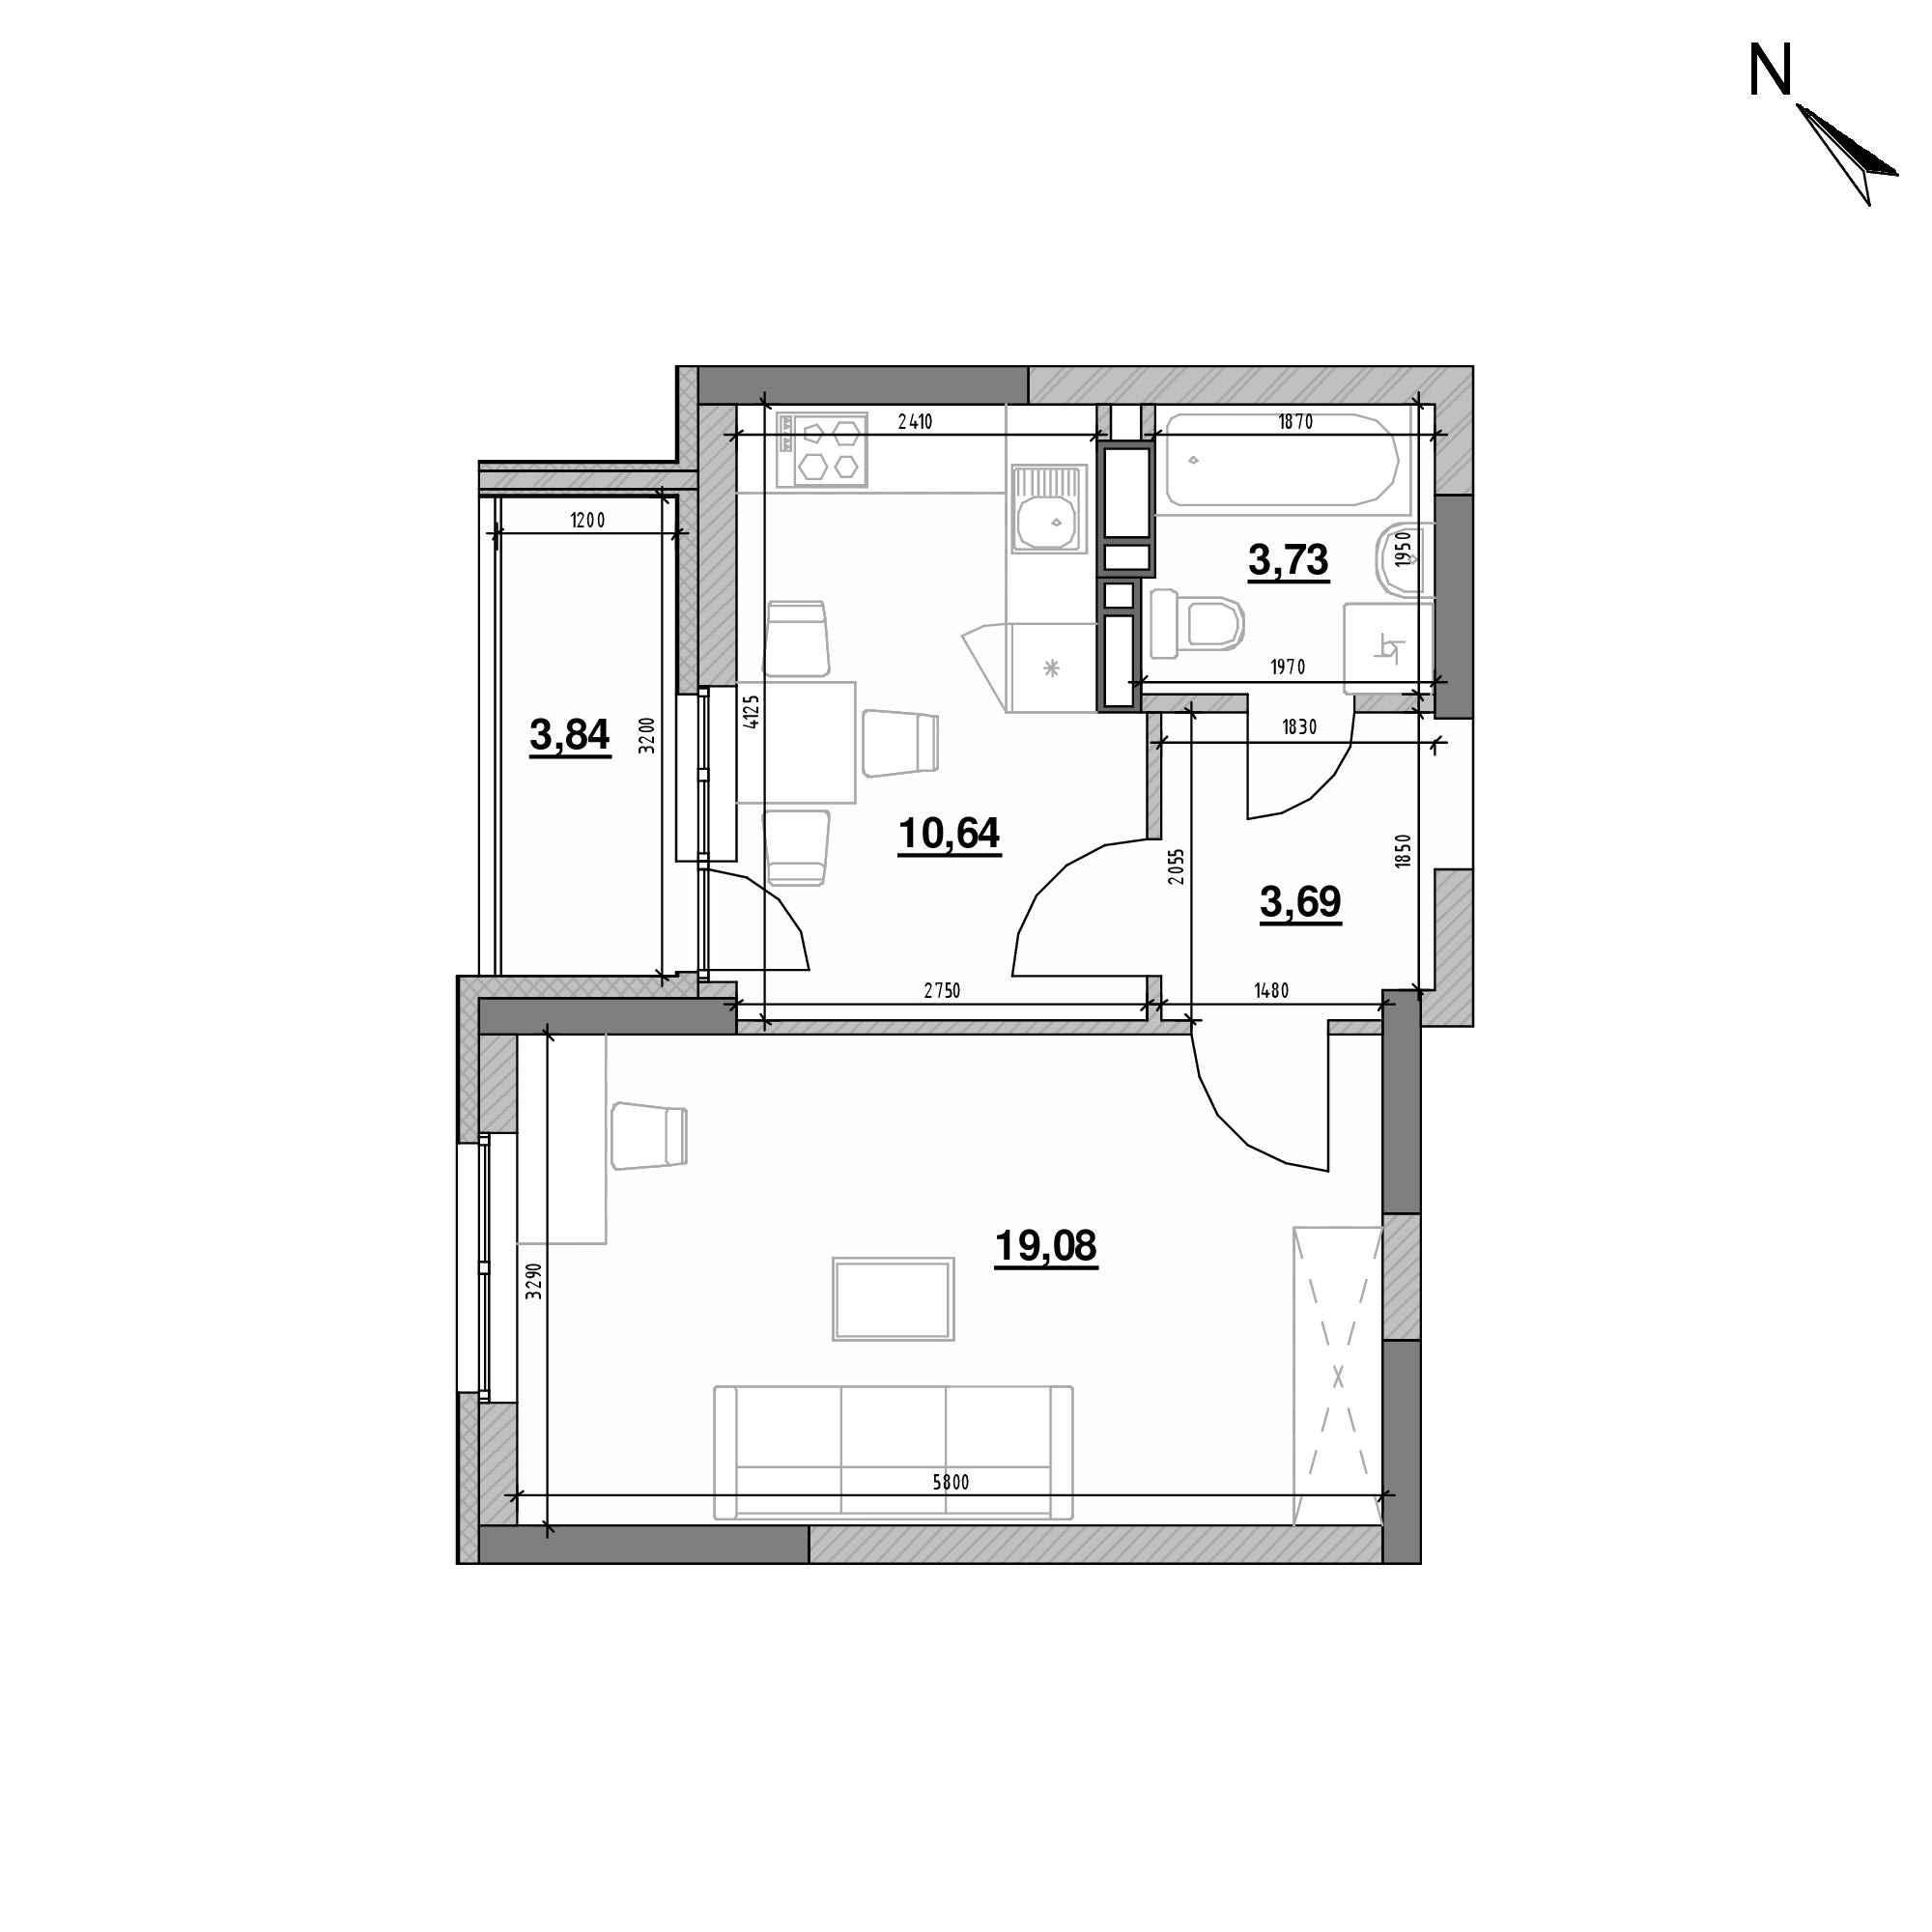 ЖК Оk'Land: планування 1-кімнатної квартири, №150, 40.98 м<sup>2</sup>